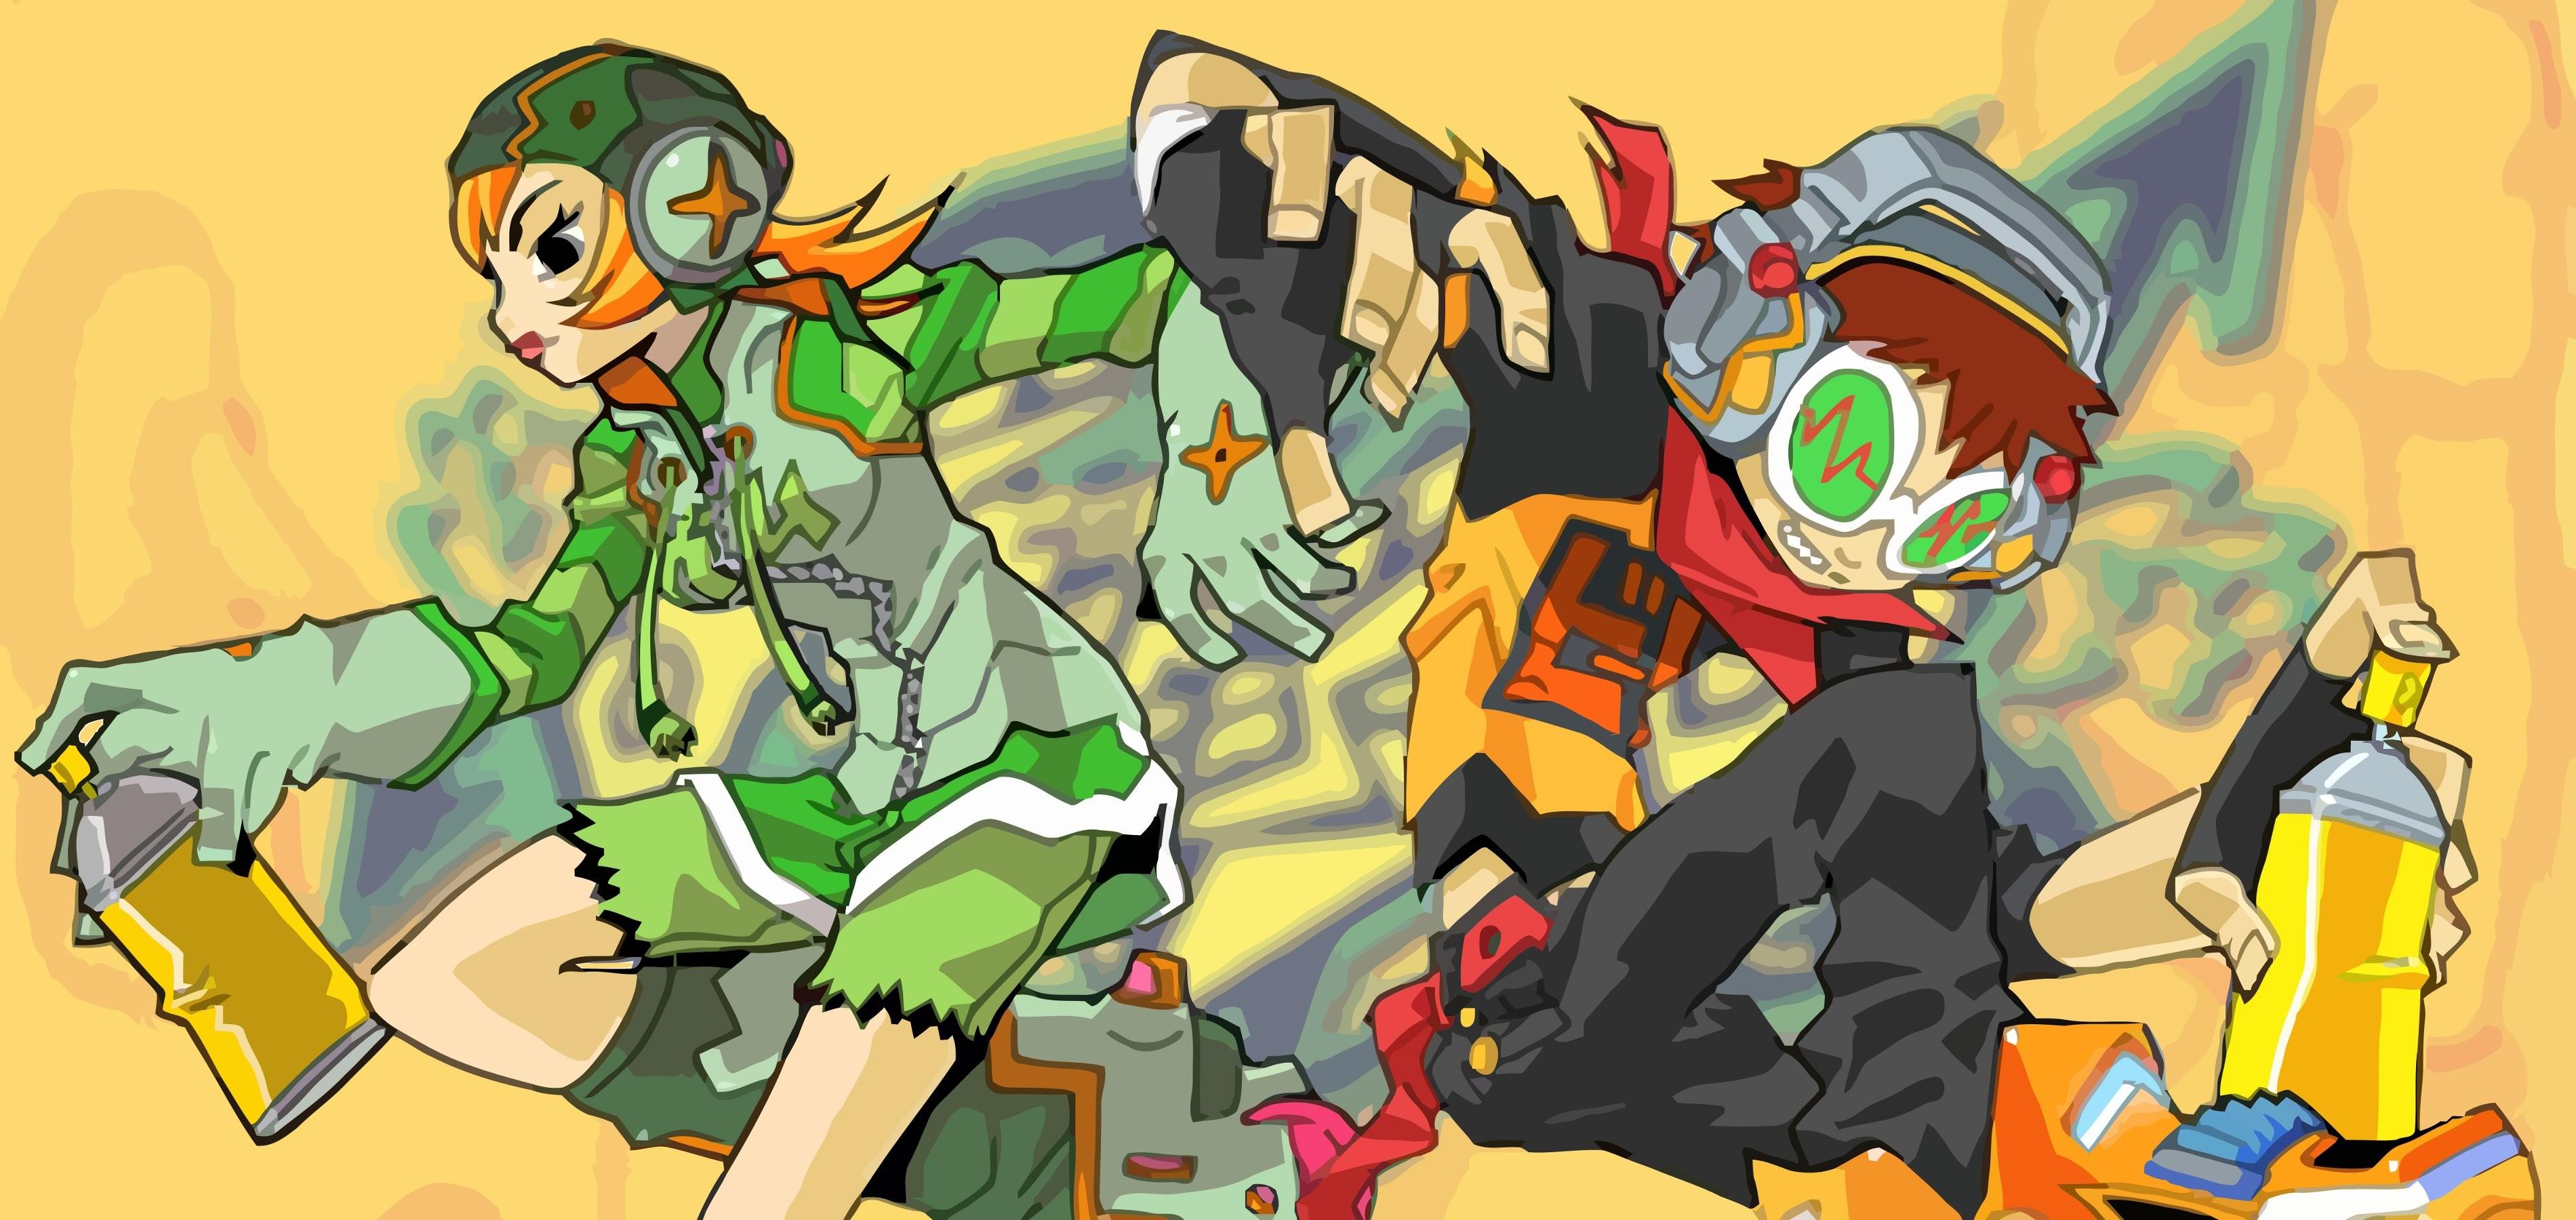 JET SET RADIO action platform sports grind sega anime game (10) wallpaper |  | 241143 | WallpaperUP